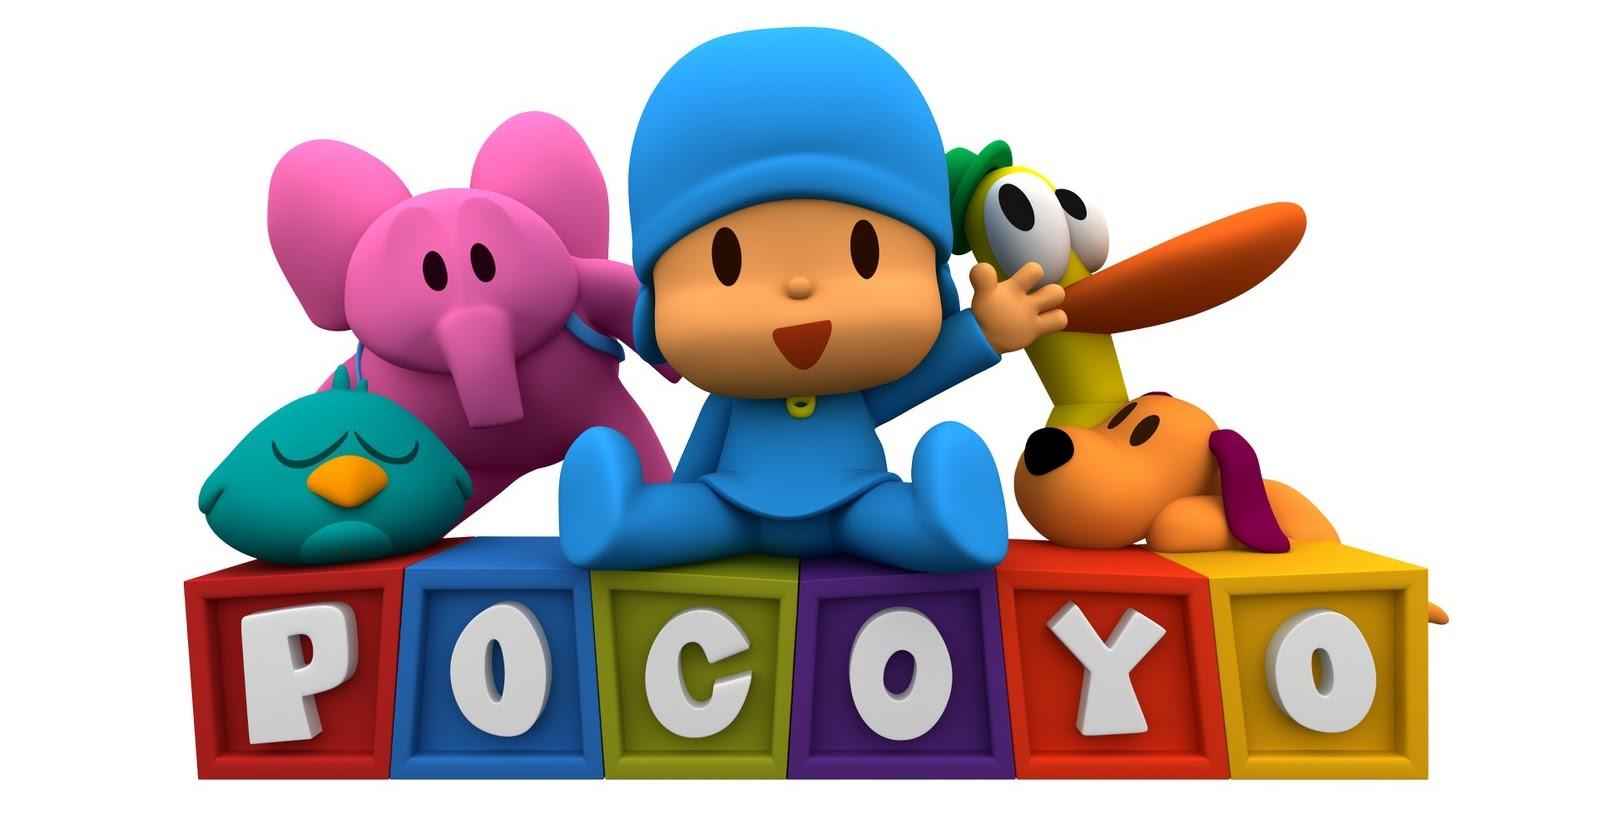 Spanish Cartoons For Kids Pocoyo Bilingual Kidspot - Cartoons-images-for-kids